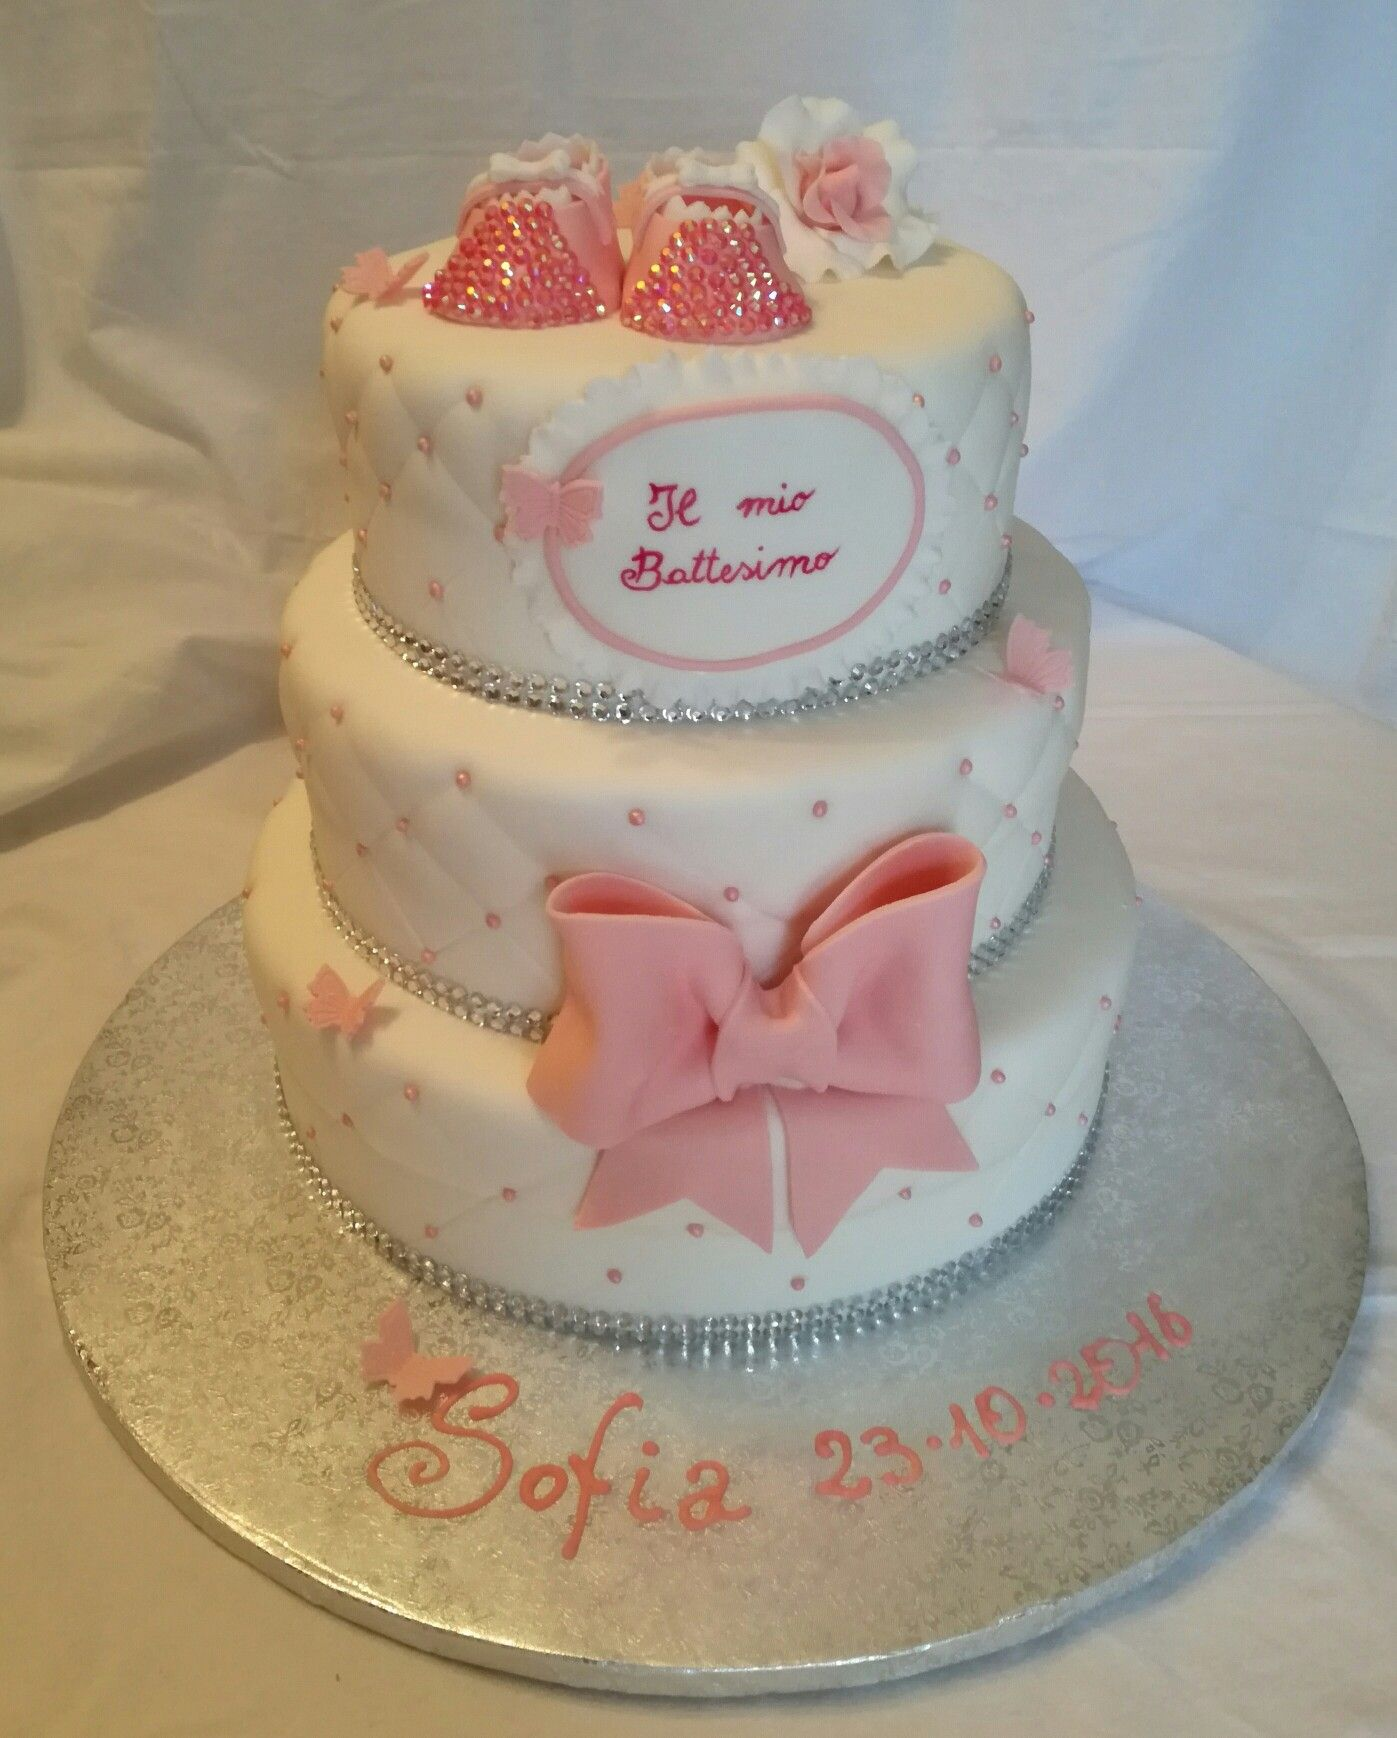 Popolare Torta battesimo bimba | Torte per battesimo, Torte, Battesimo IJ75